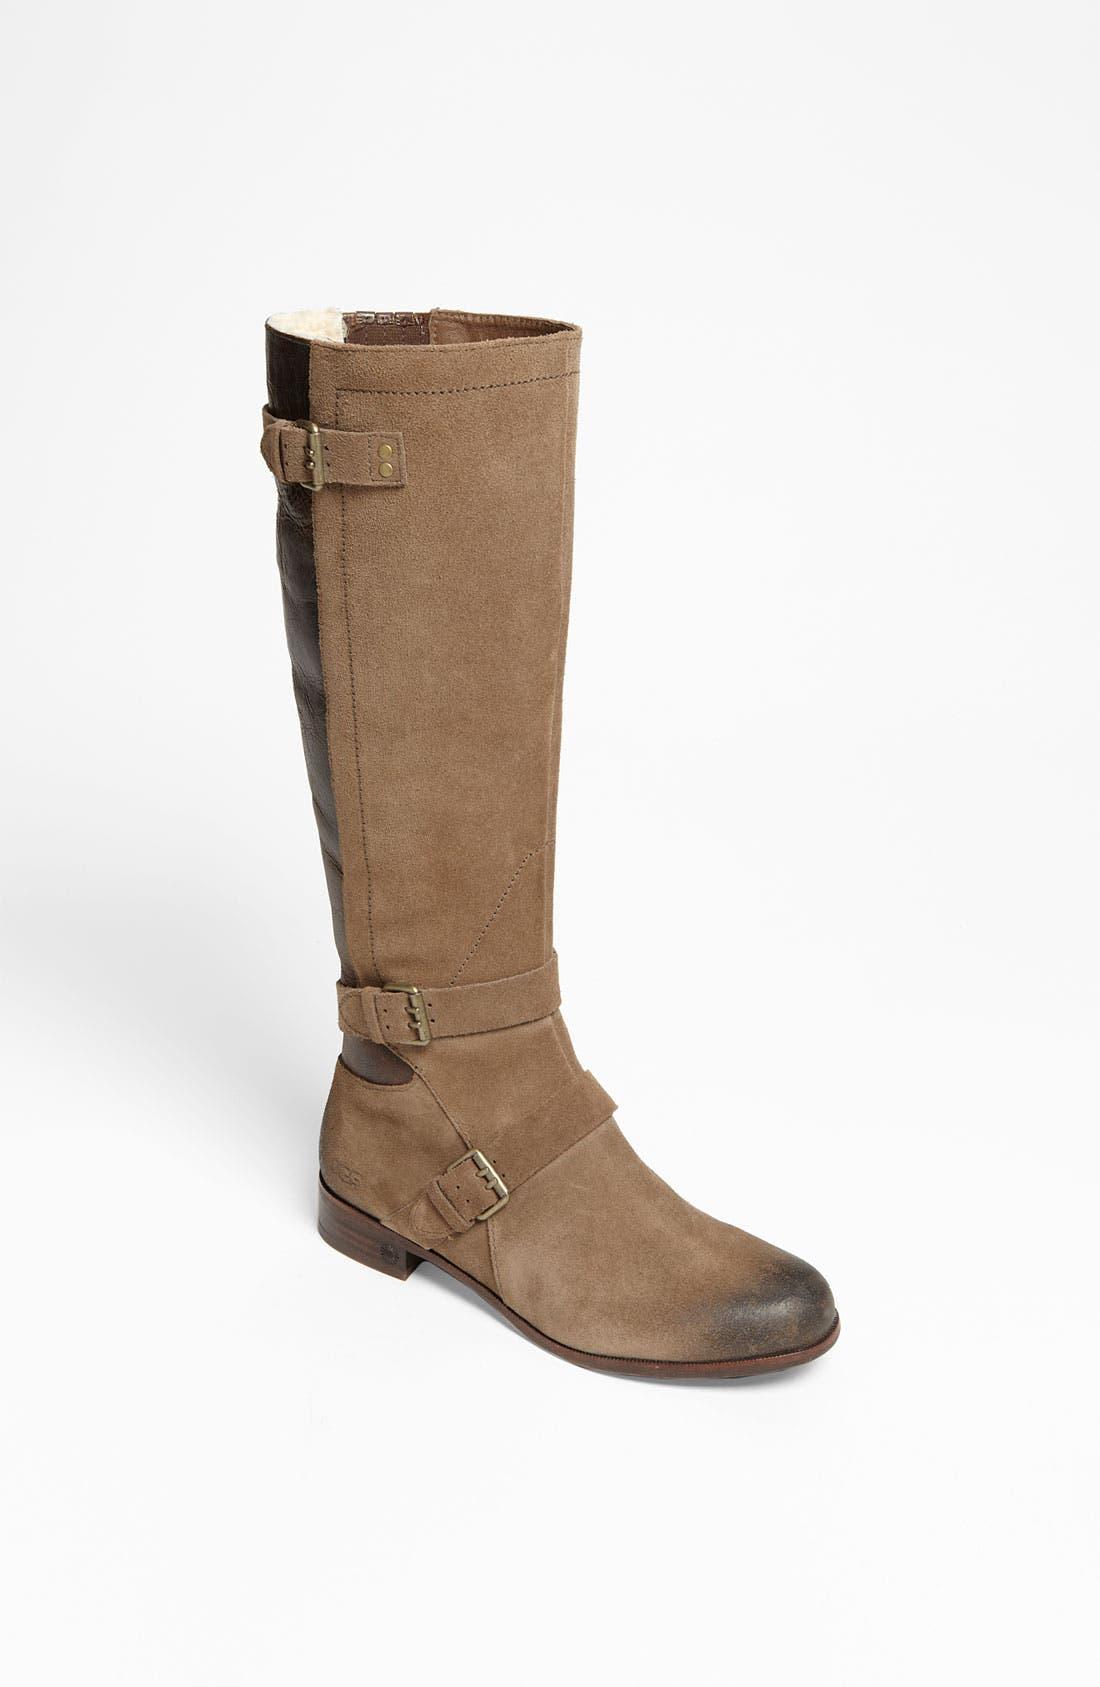 Alternate Image 1 Selected - UGG® Australia 'Cydnee' Boot (Women)